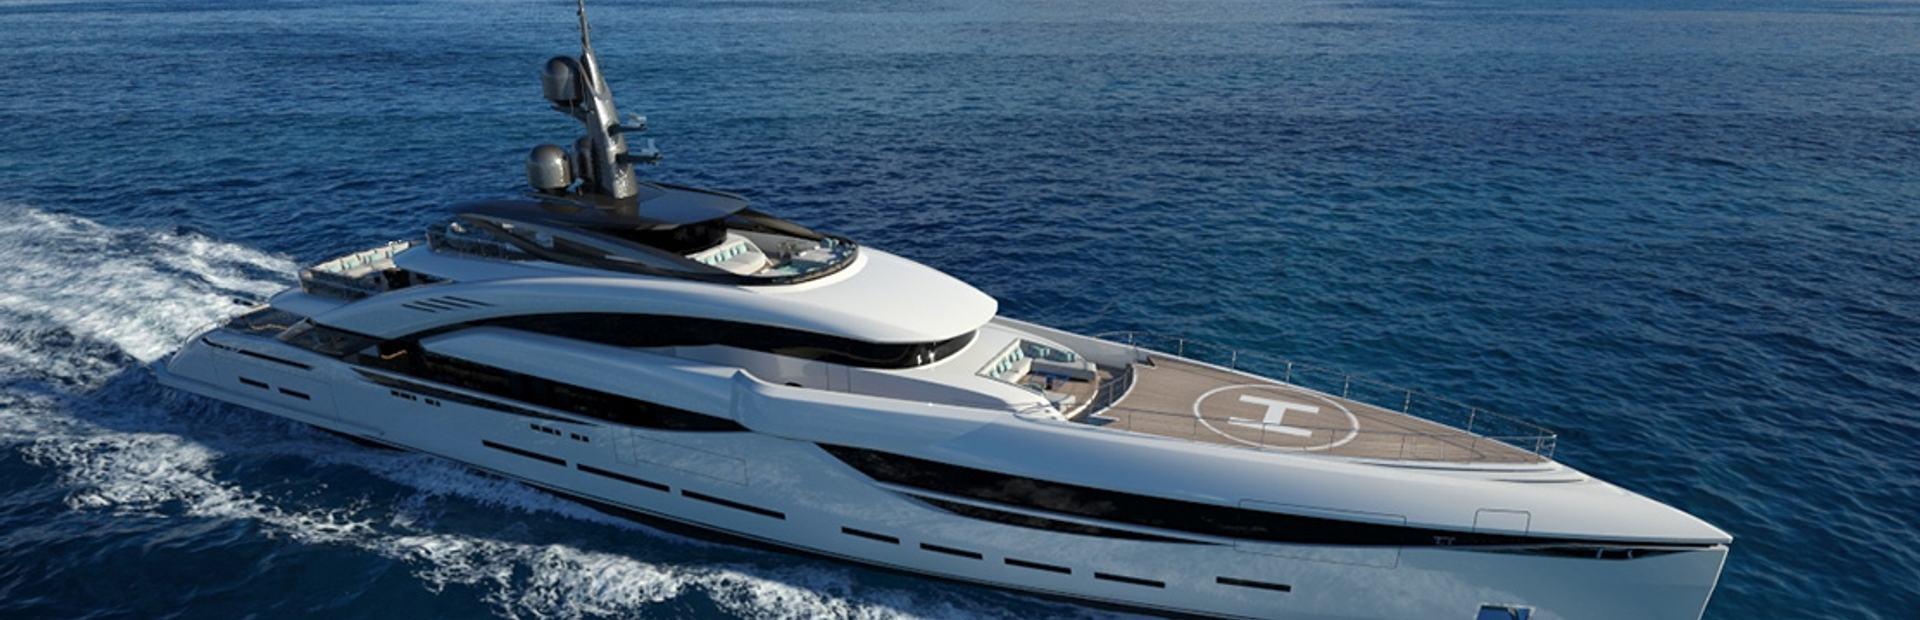 GranTurismo 67 Yacht Charter